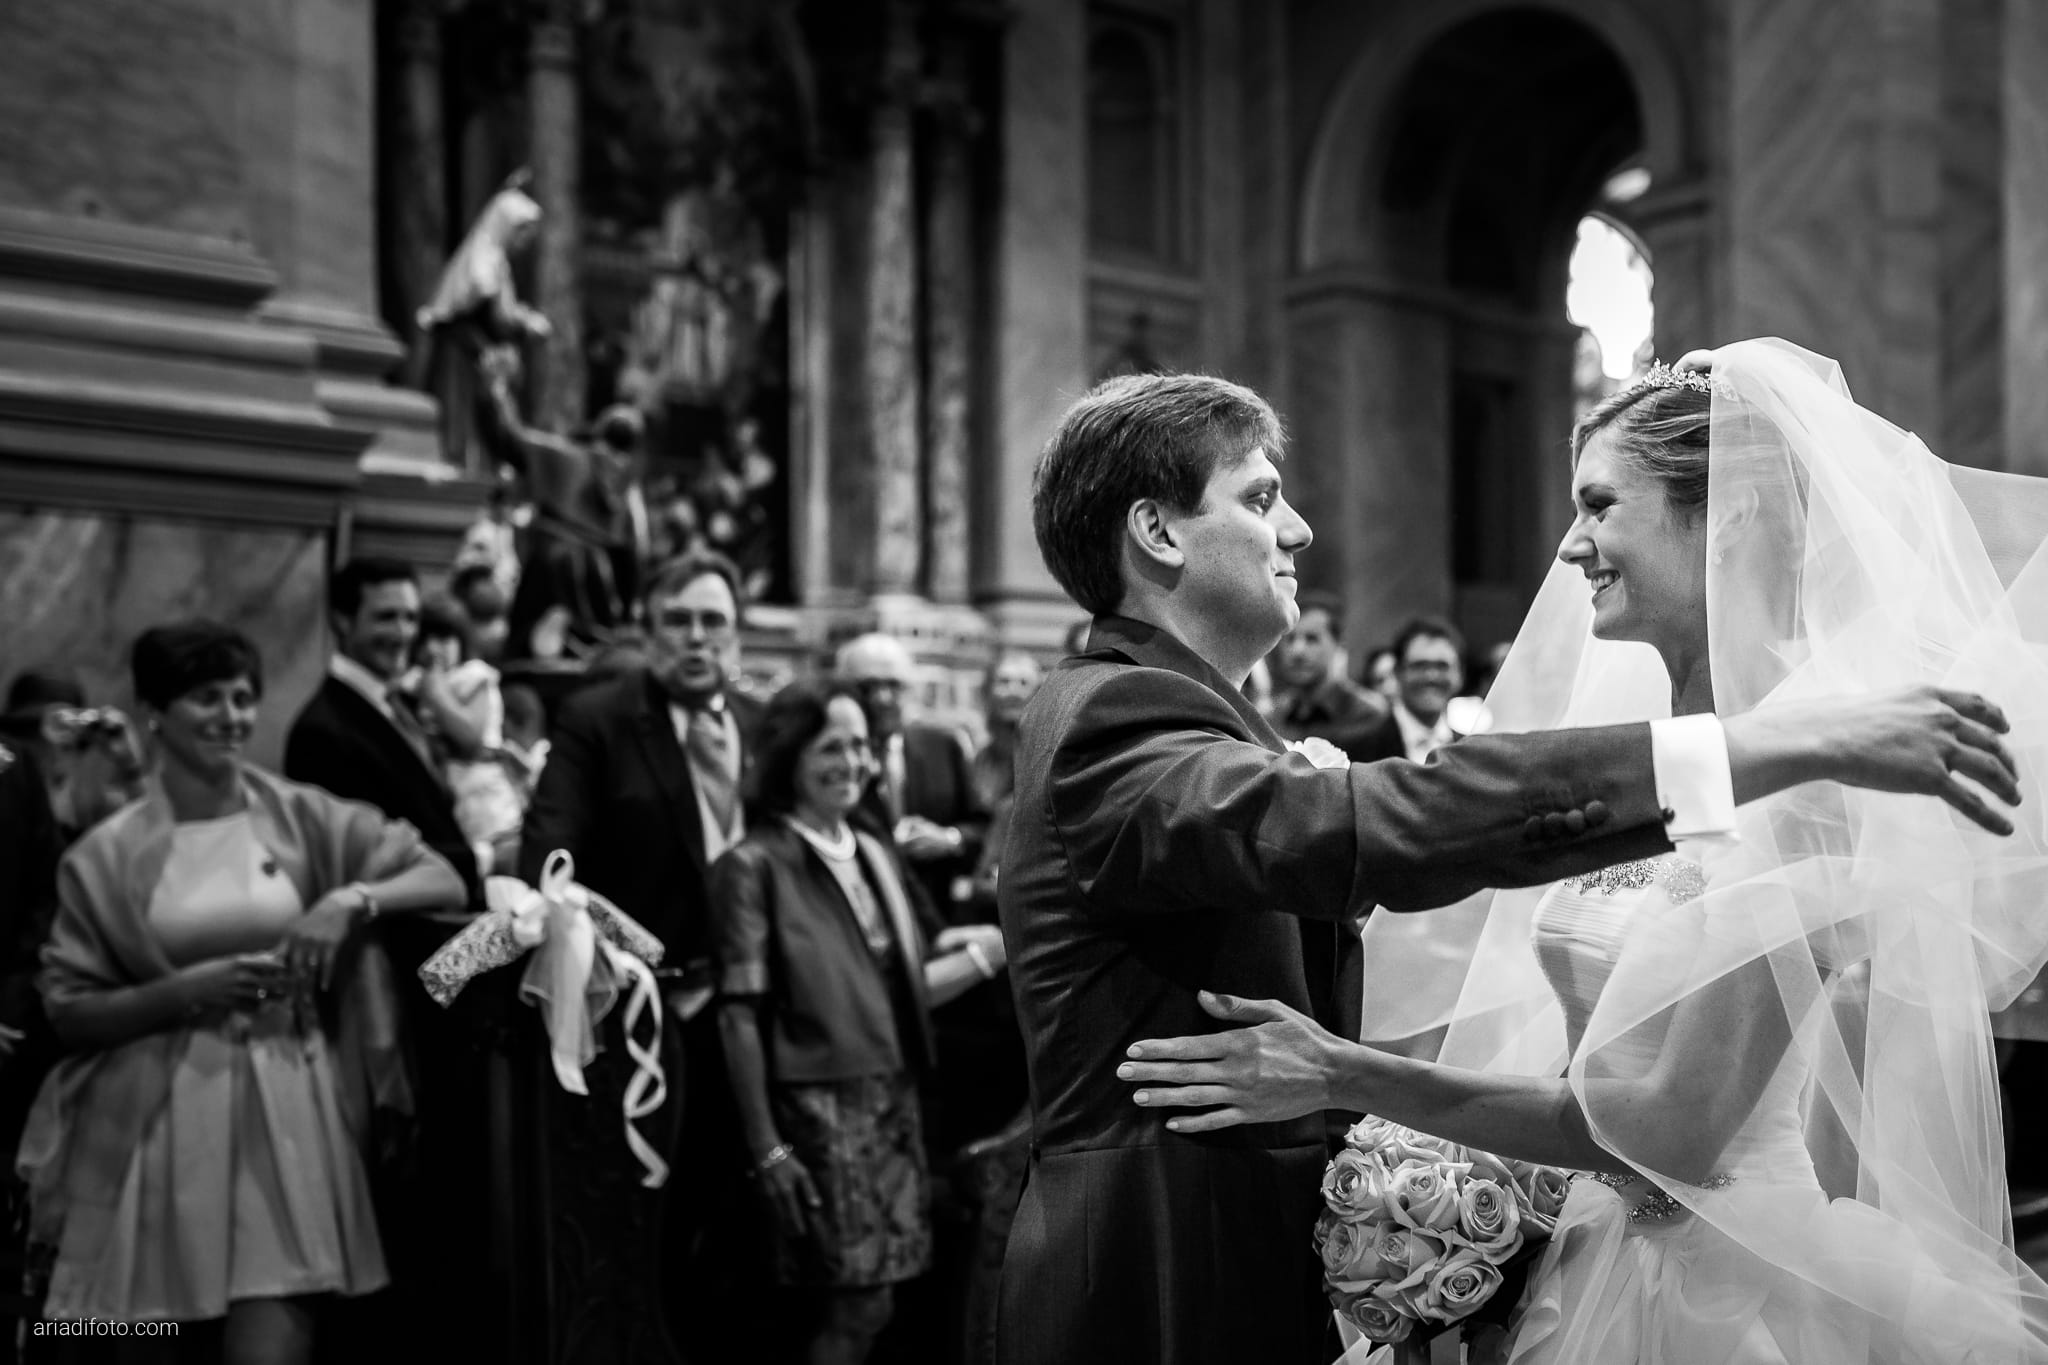 Martina Maurizio matrimonio Trieste Castello Spessa Gorizia cerimonia Santa Maria Maggiore ingresso sposa